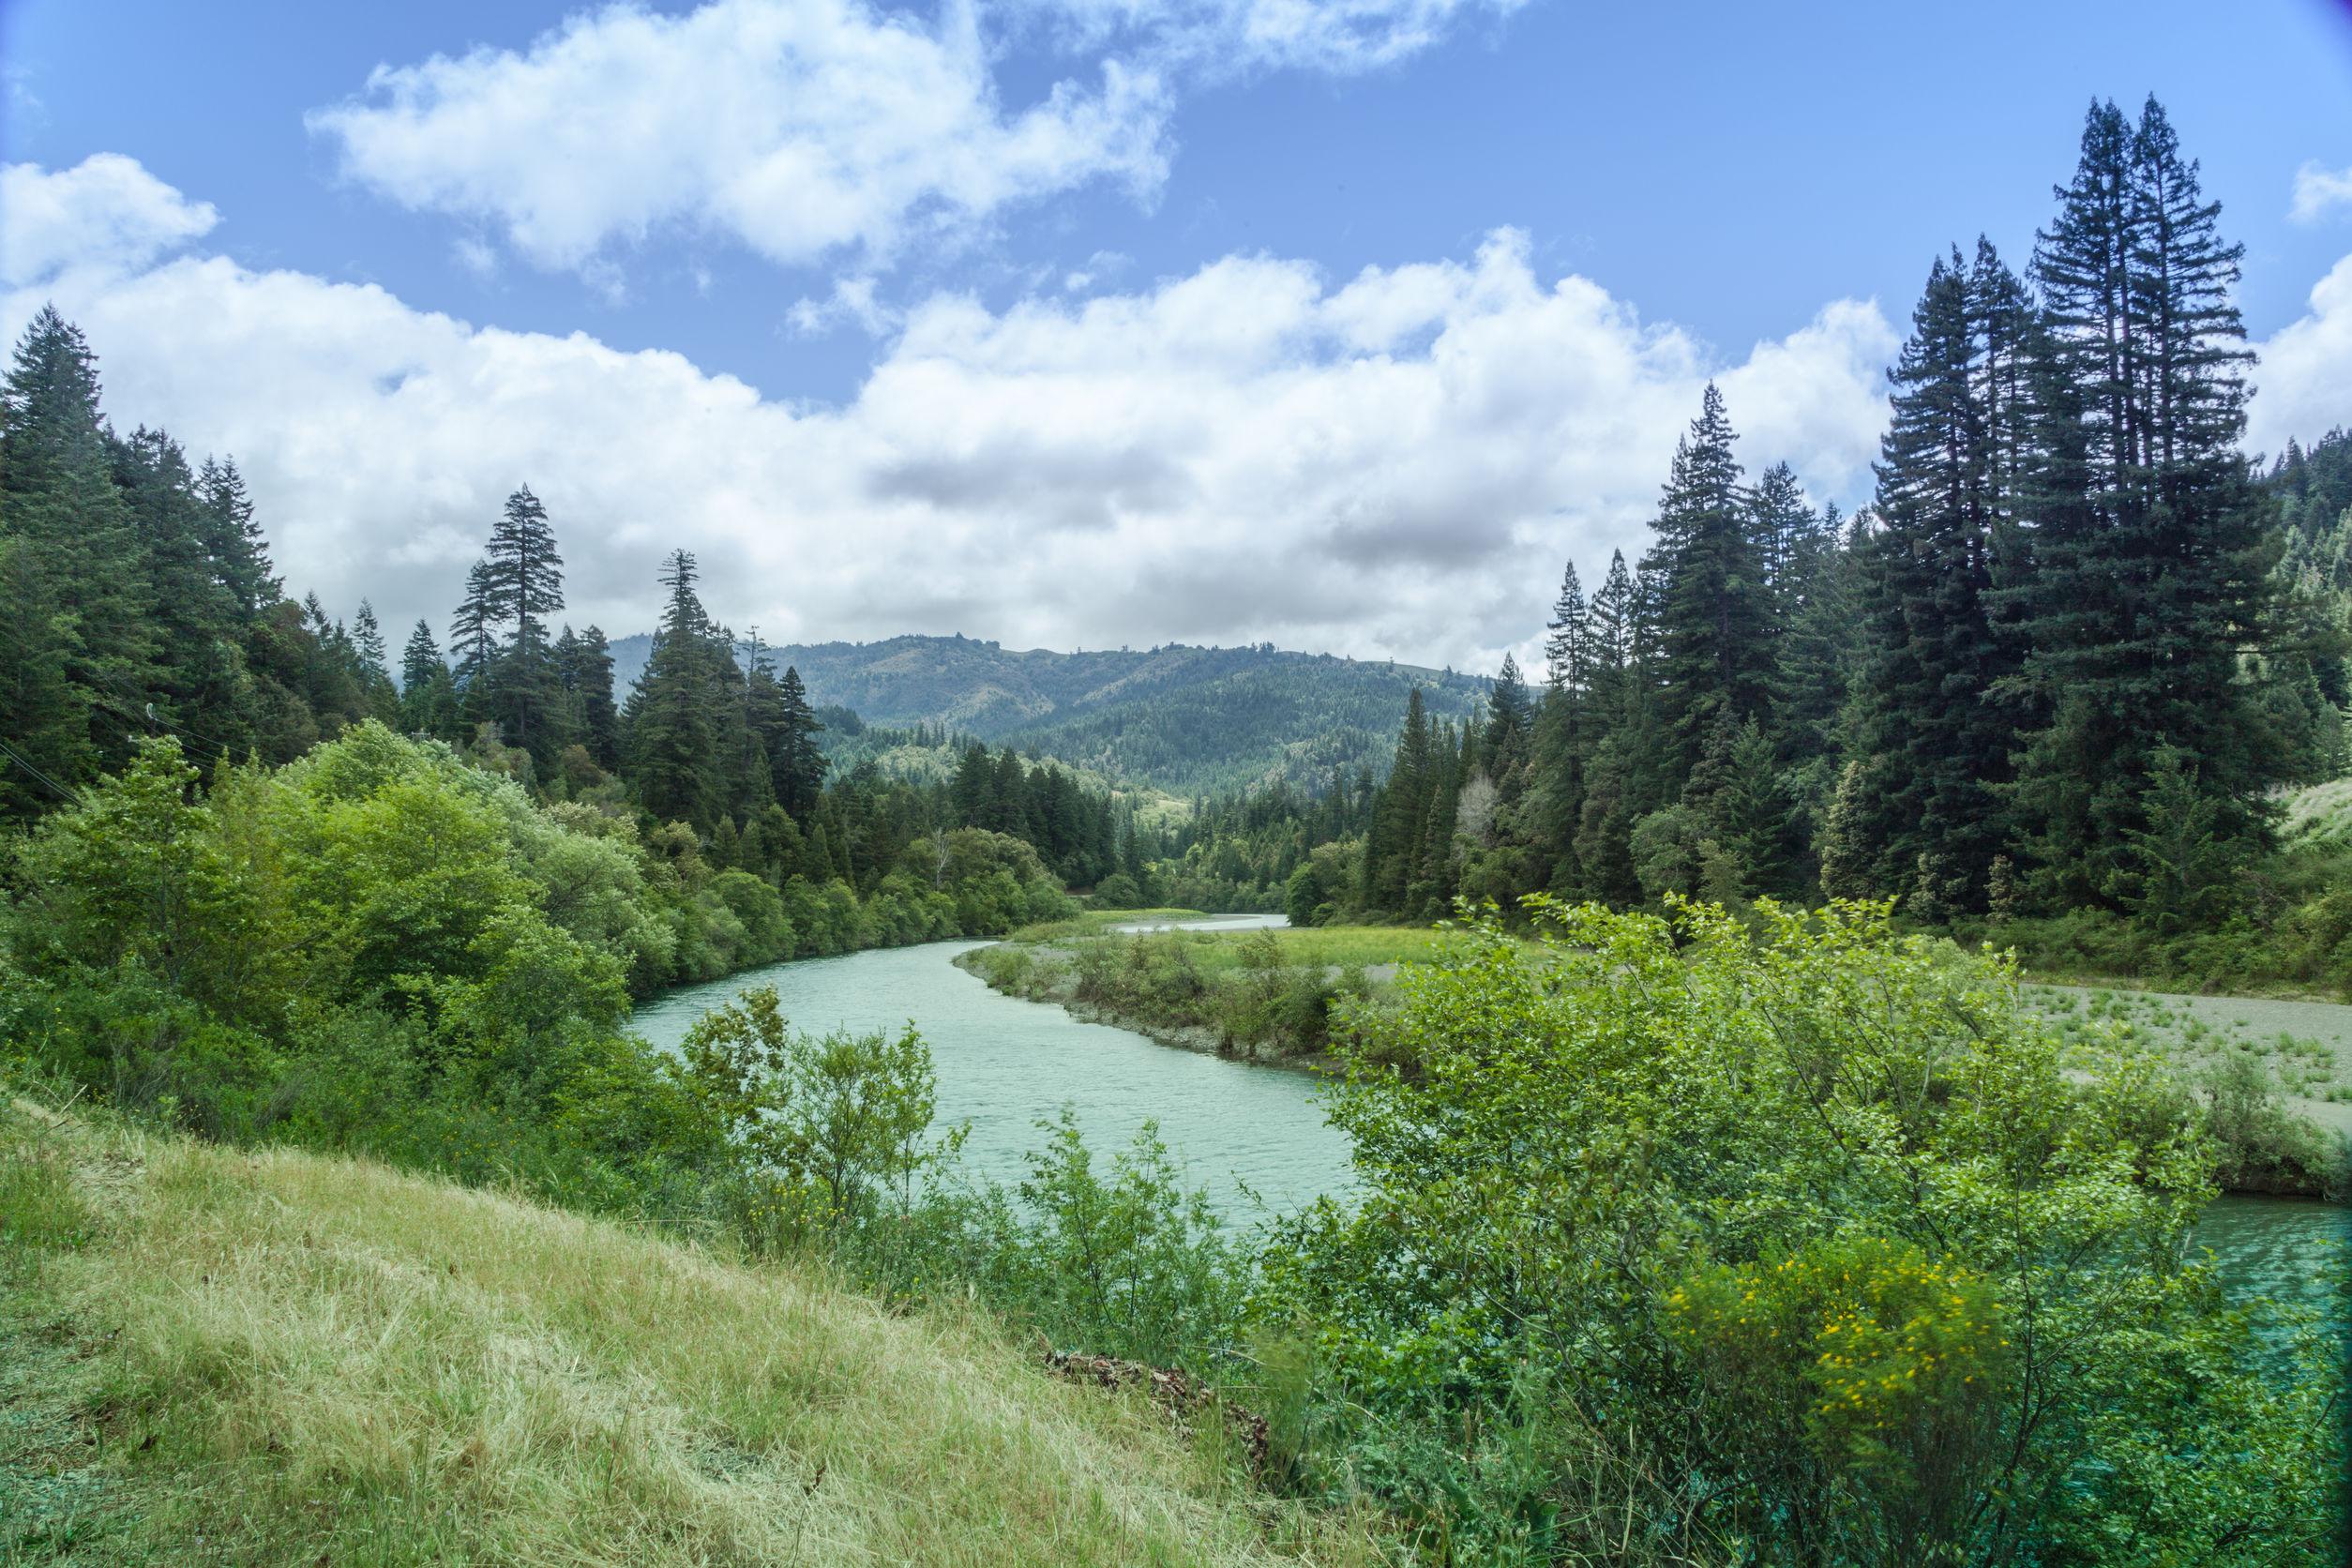 river-landscape-trees-california-usa